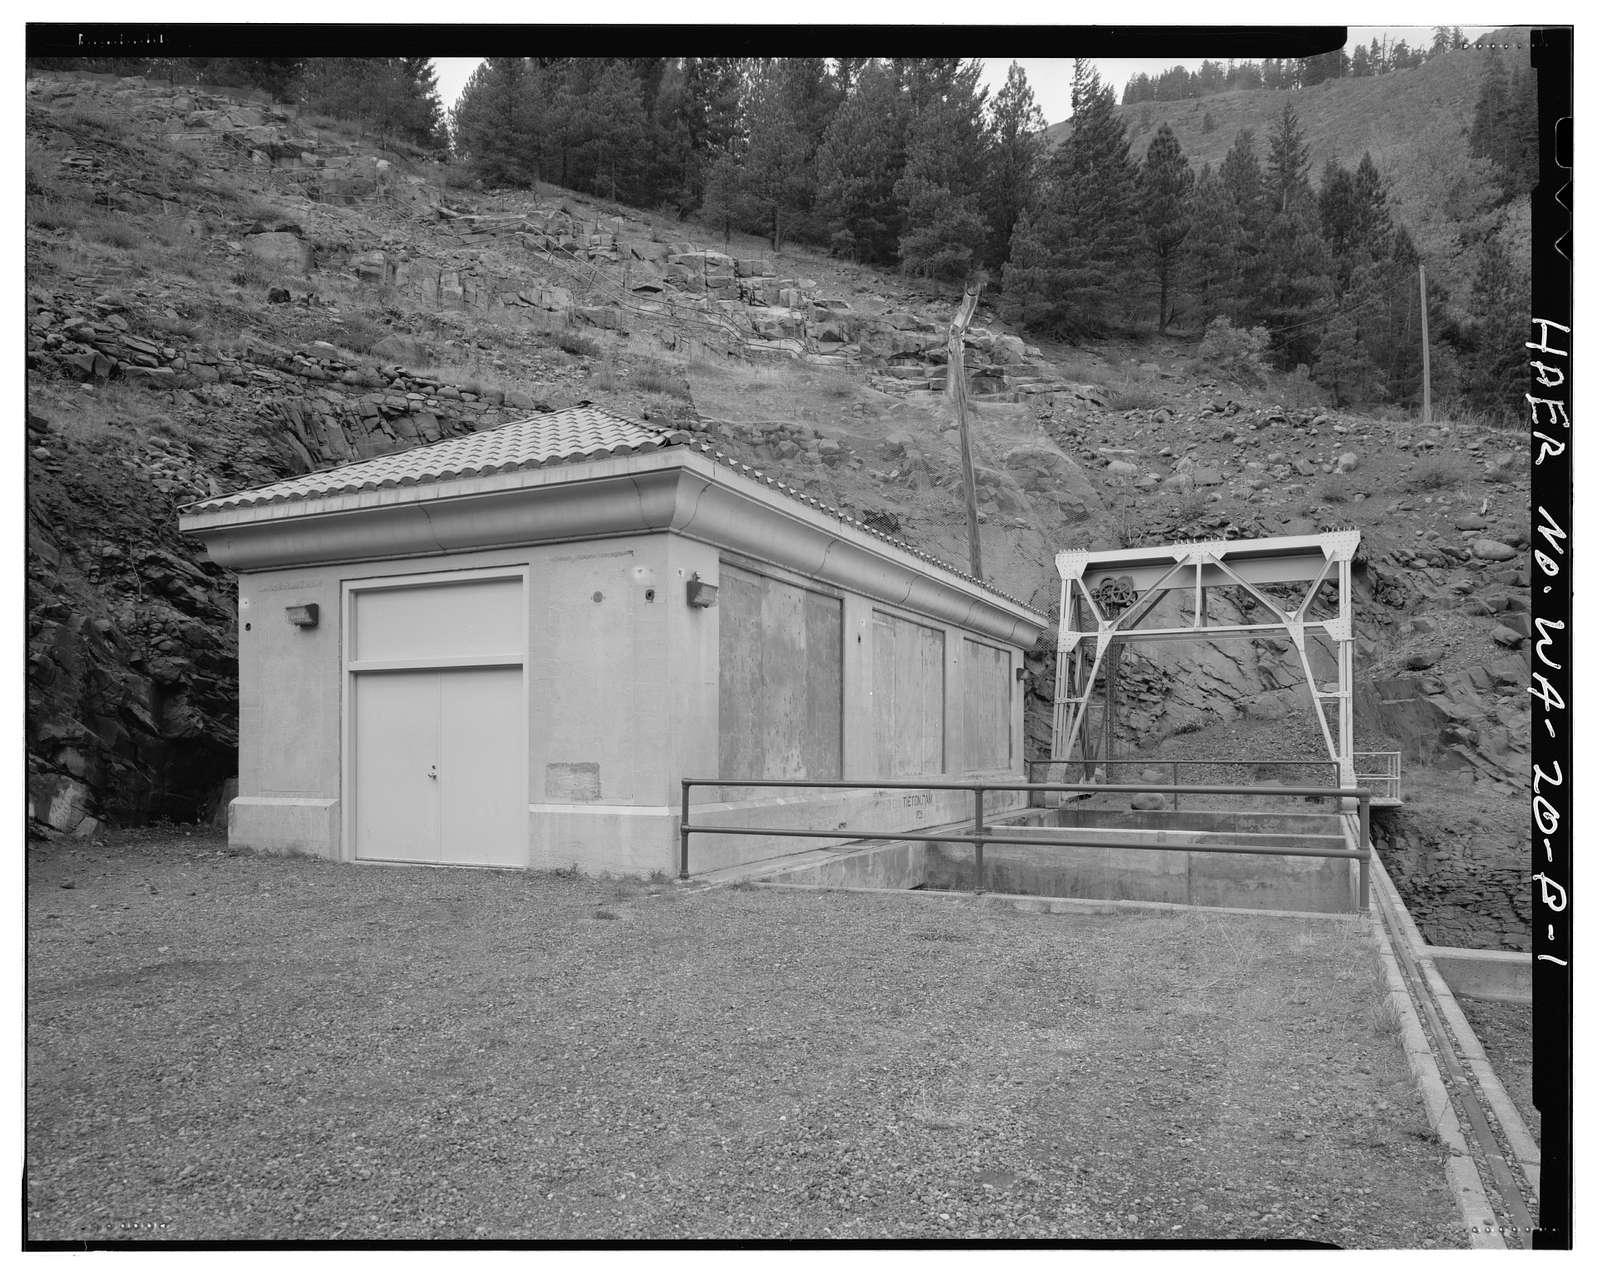 Tieton Dam, Valve House, South & East side of State Highway 12, Naches, Yakima County, WA